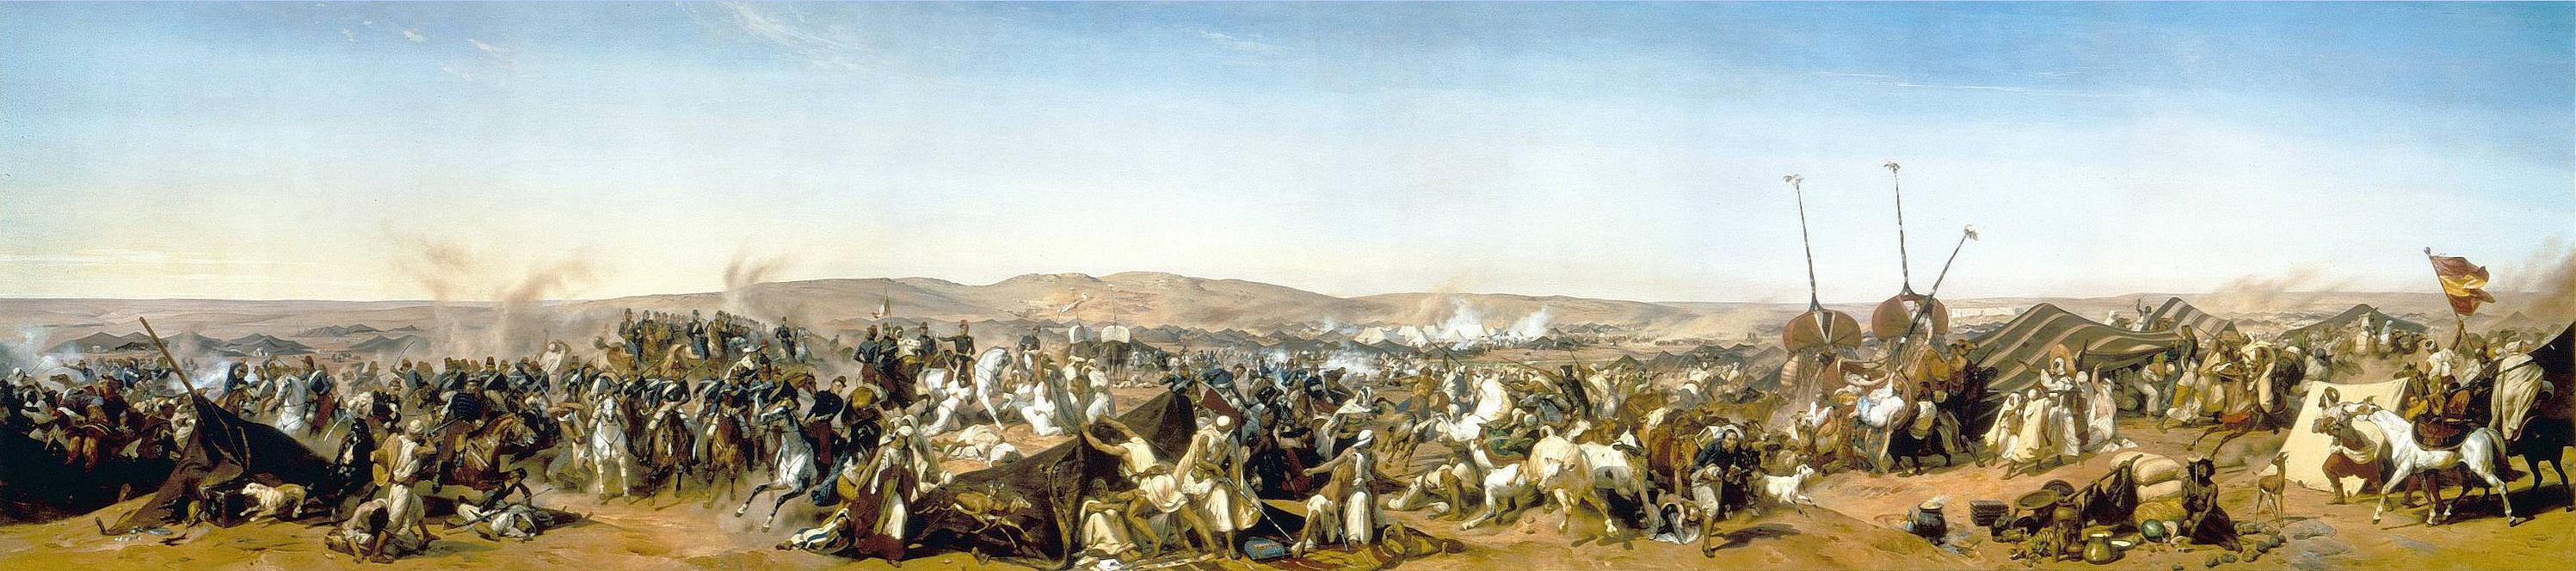 Prise_de_la_smalah_d_Abd-El-Kader_a_Taguin_16_mai_1843_Horace_Vernet